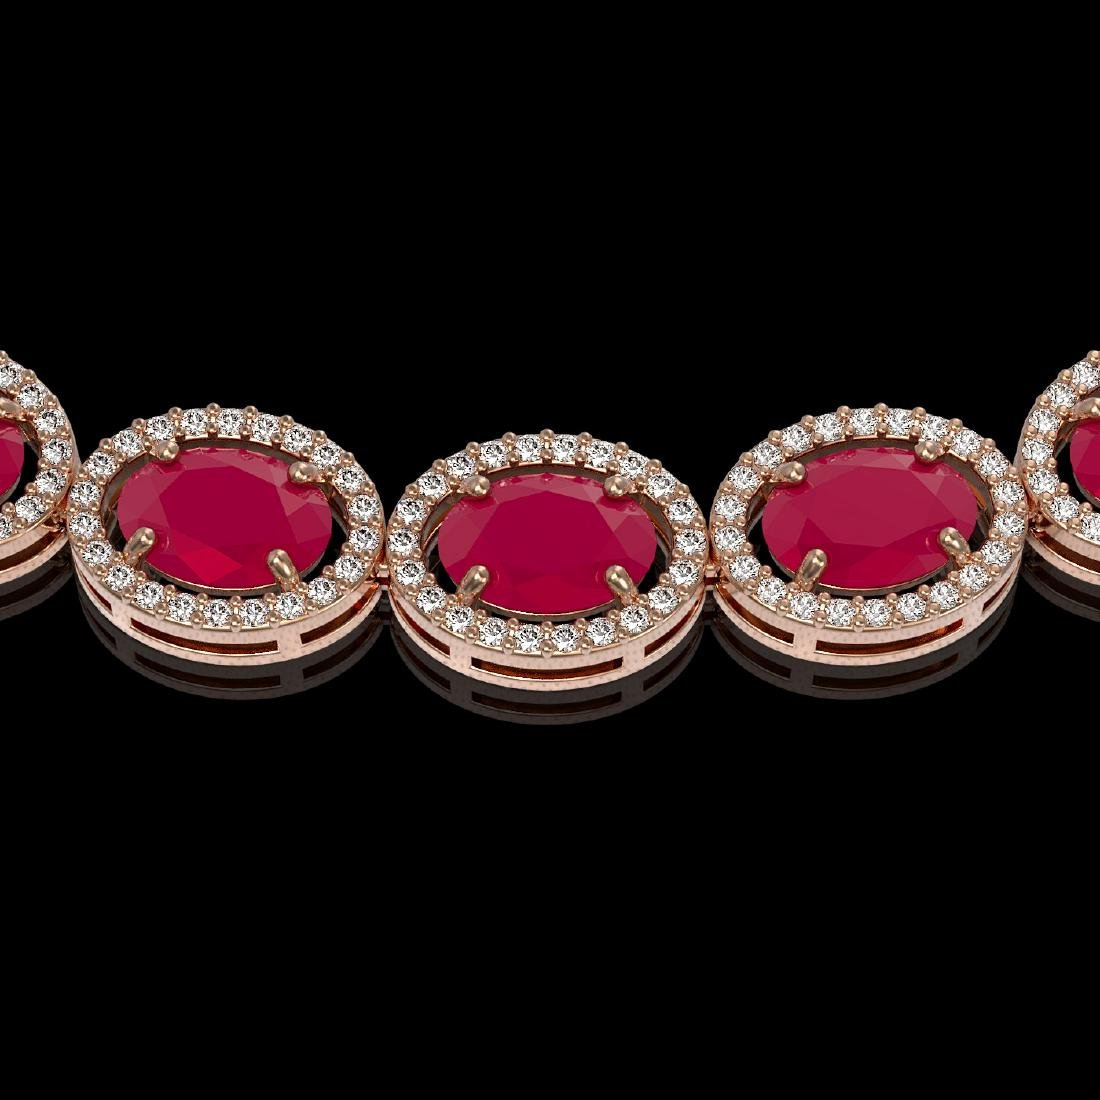 52.15 CTW Ruby & Diamond Halo Necklace 10K Rose Gold - 3